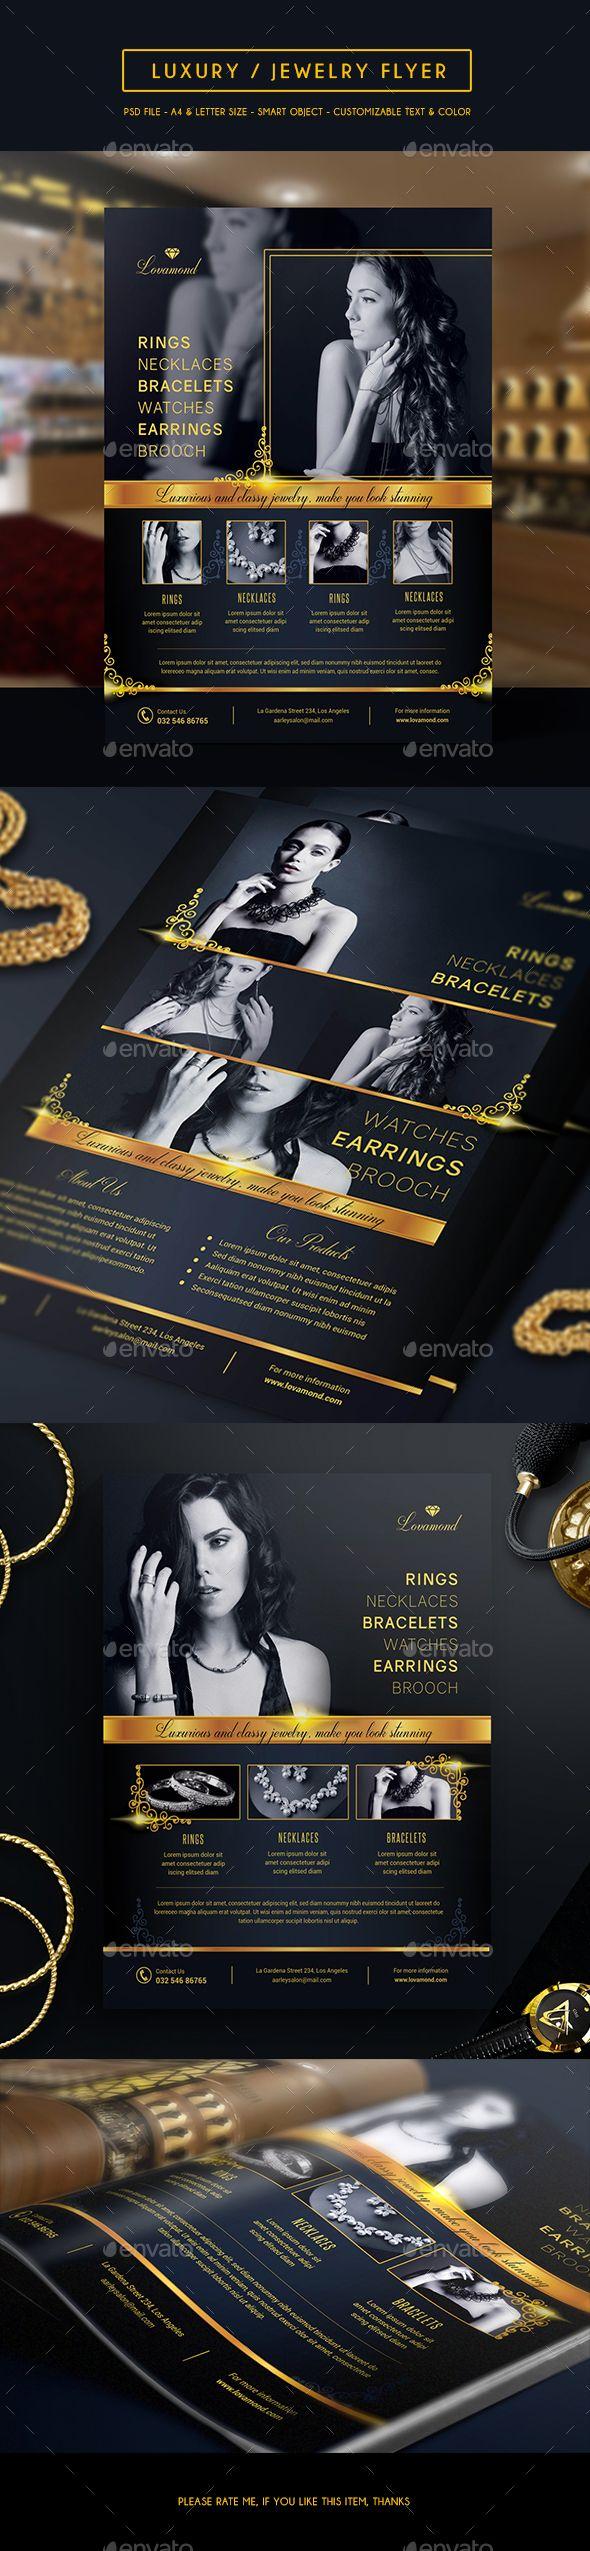 Luxury/Jewelry Store Flyer